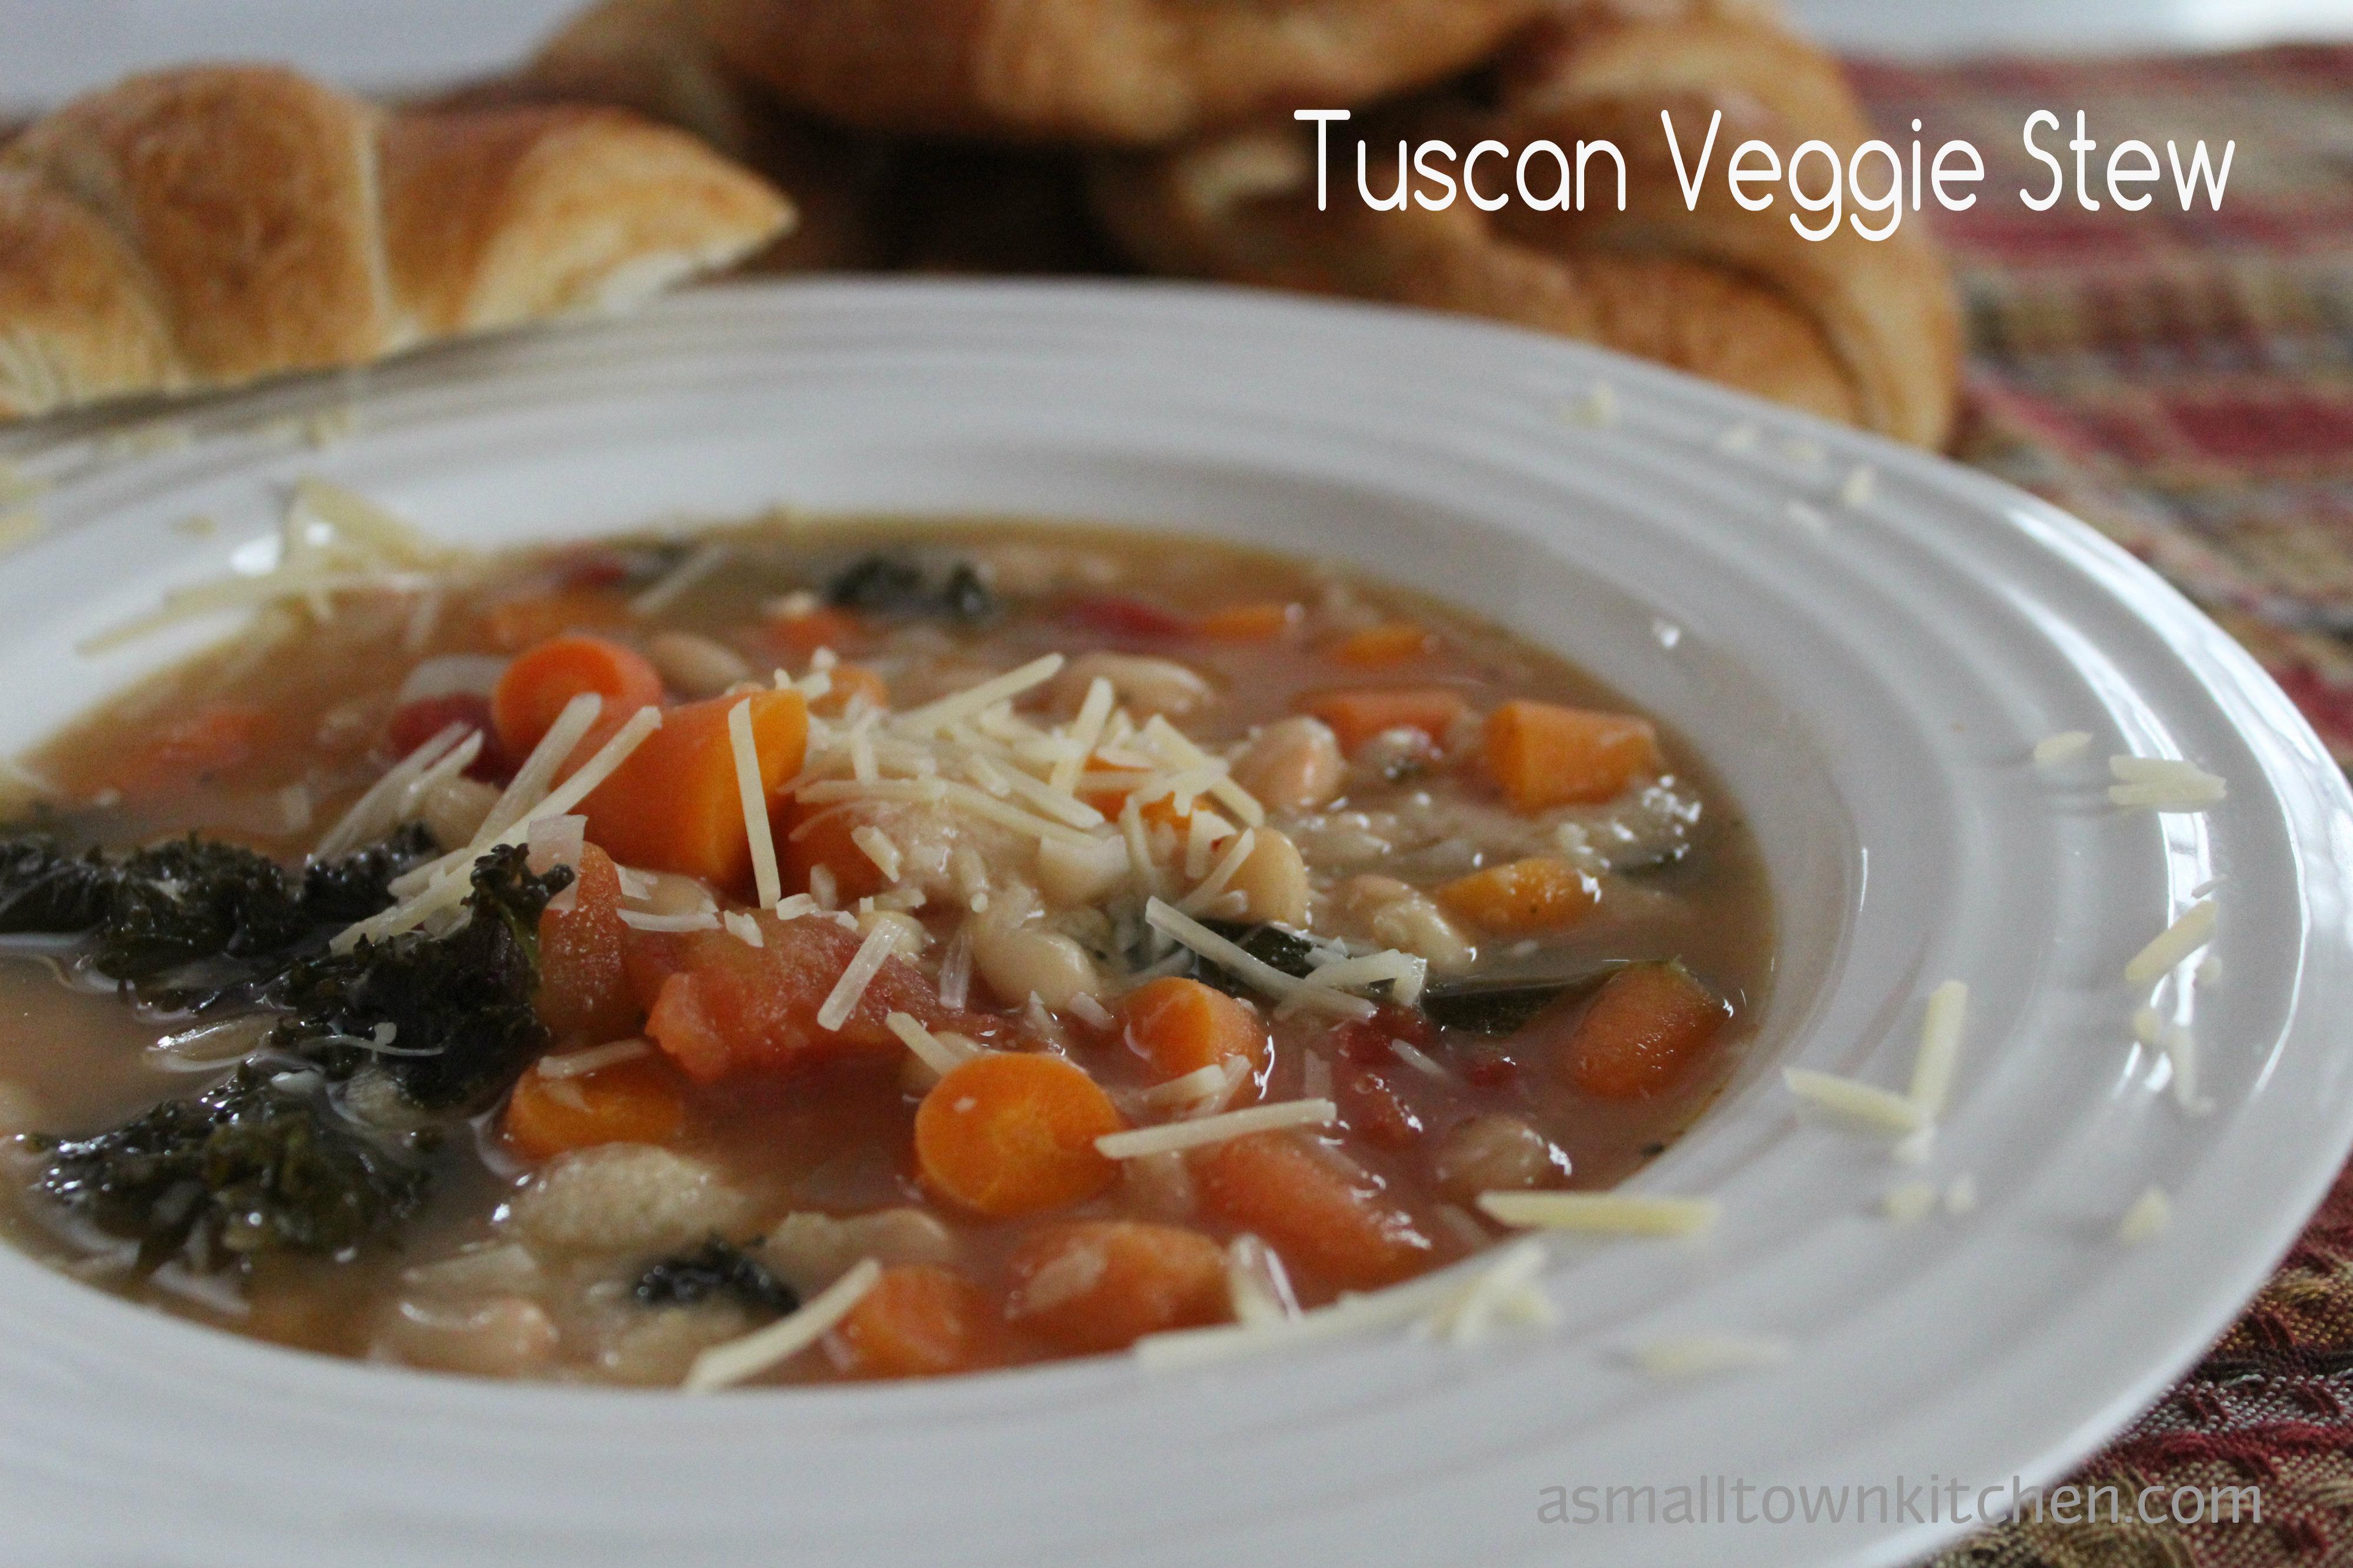 Tuscan Veggie Stew forecast